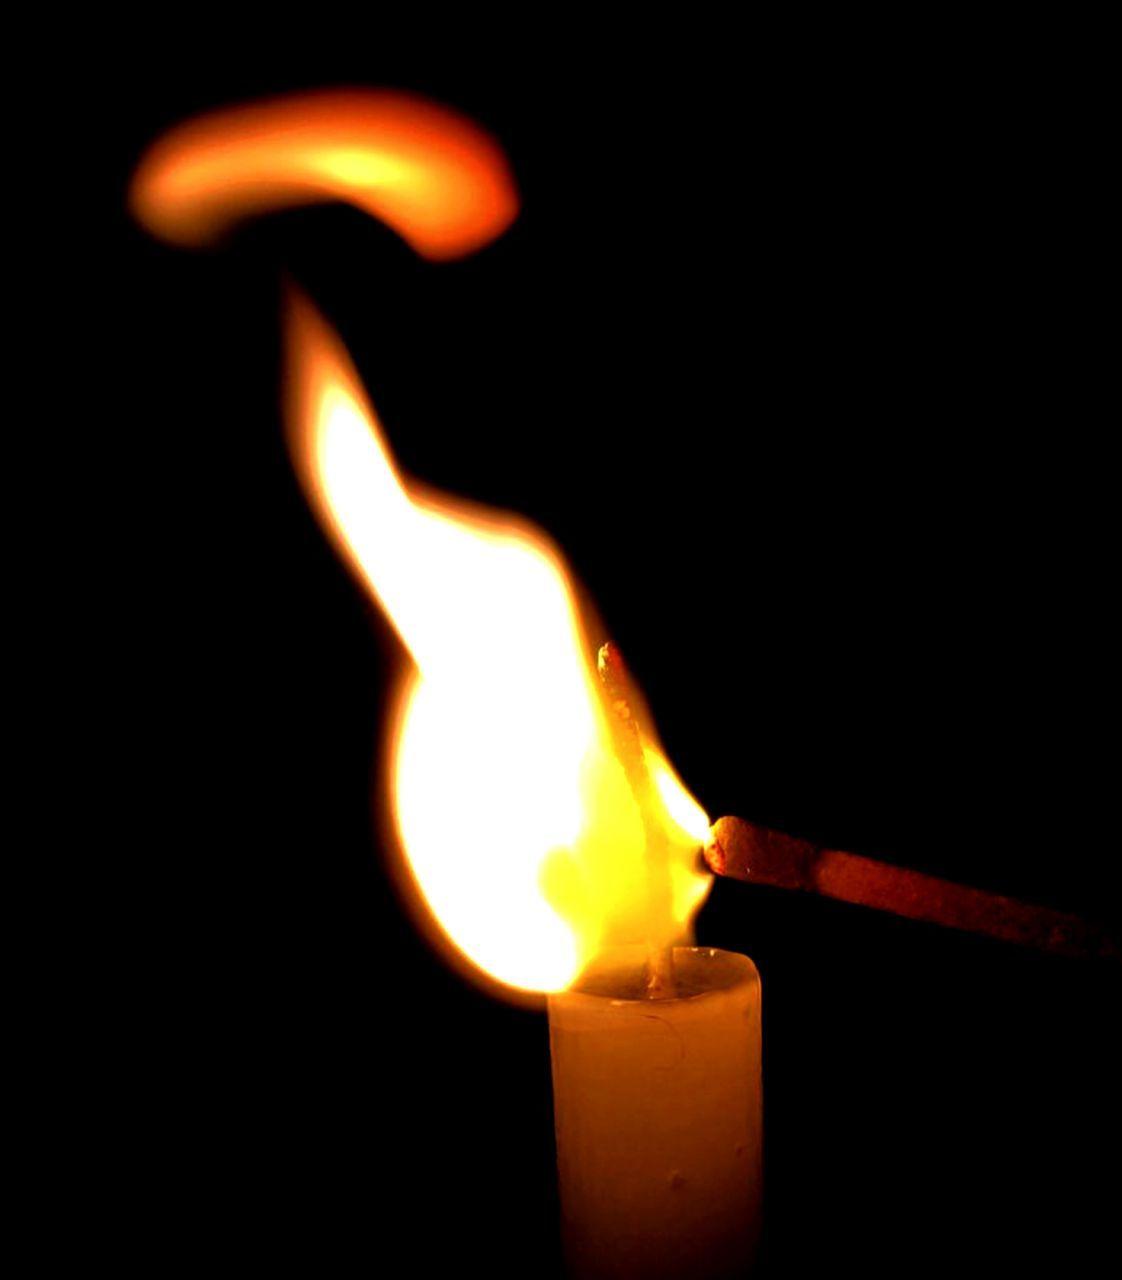 flame, burning, heat - temperature, glowing, illuminated, no people, indoors, close-up, black background, night